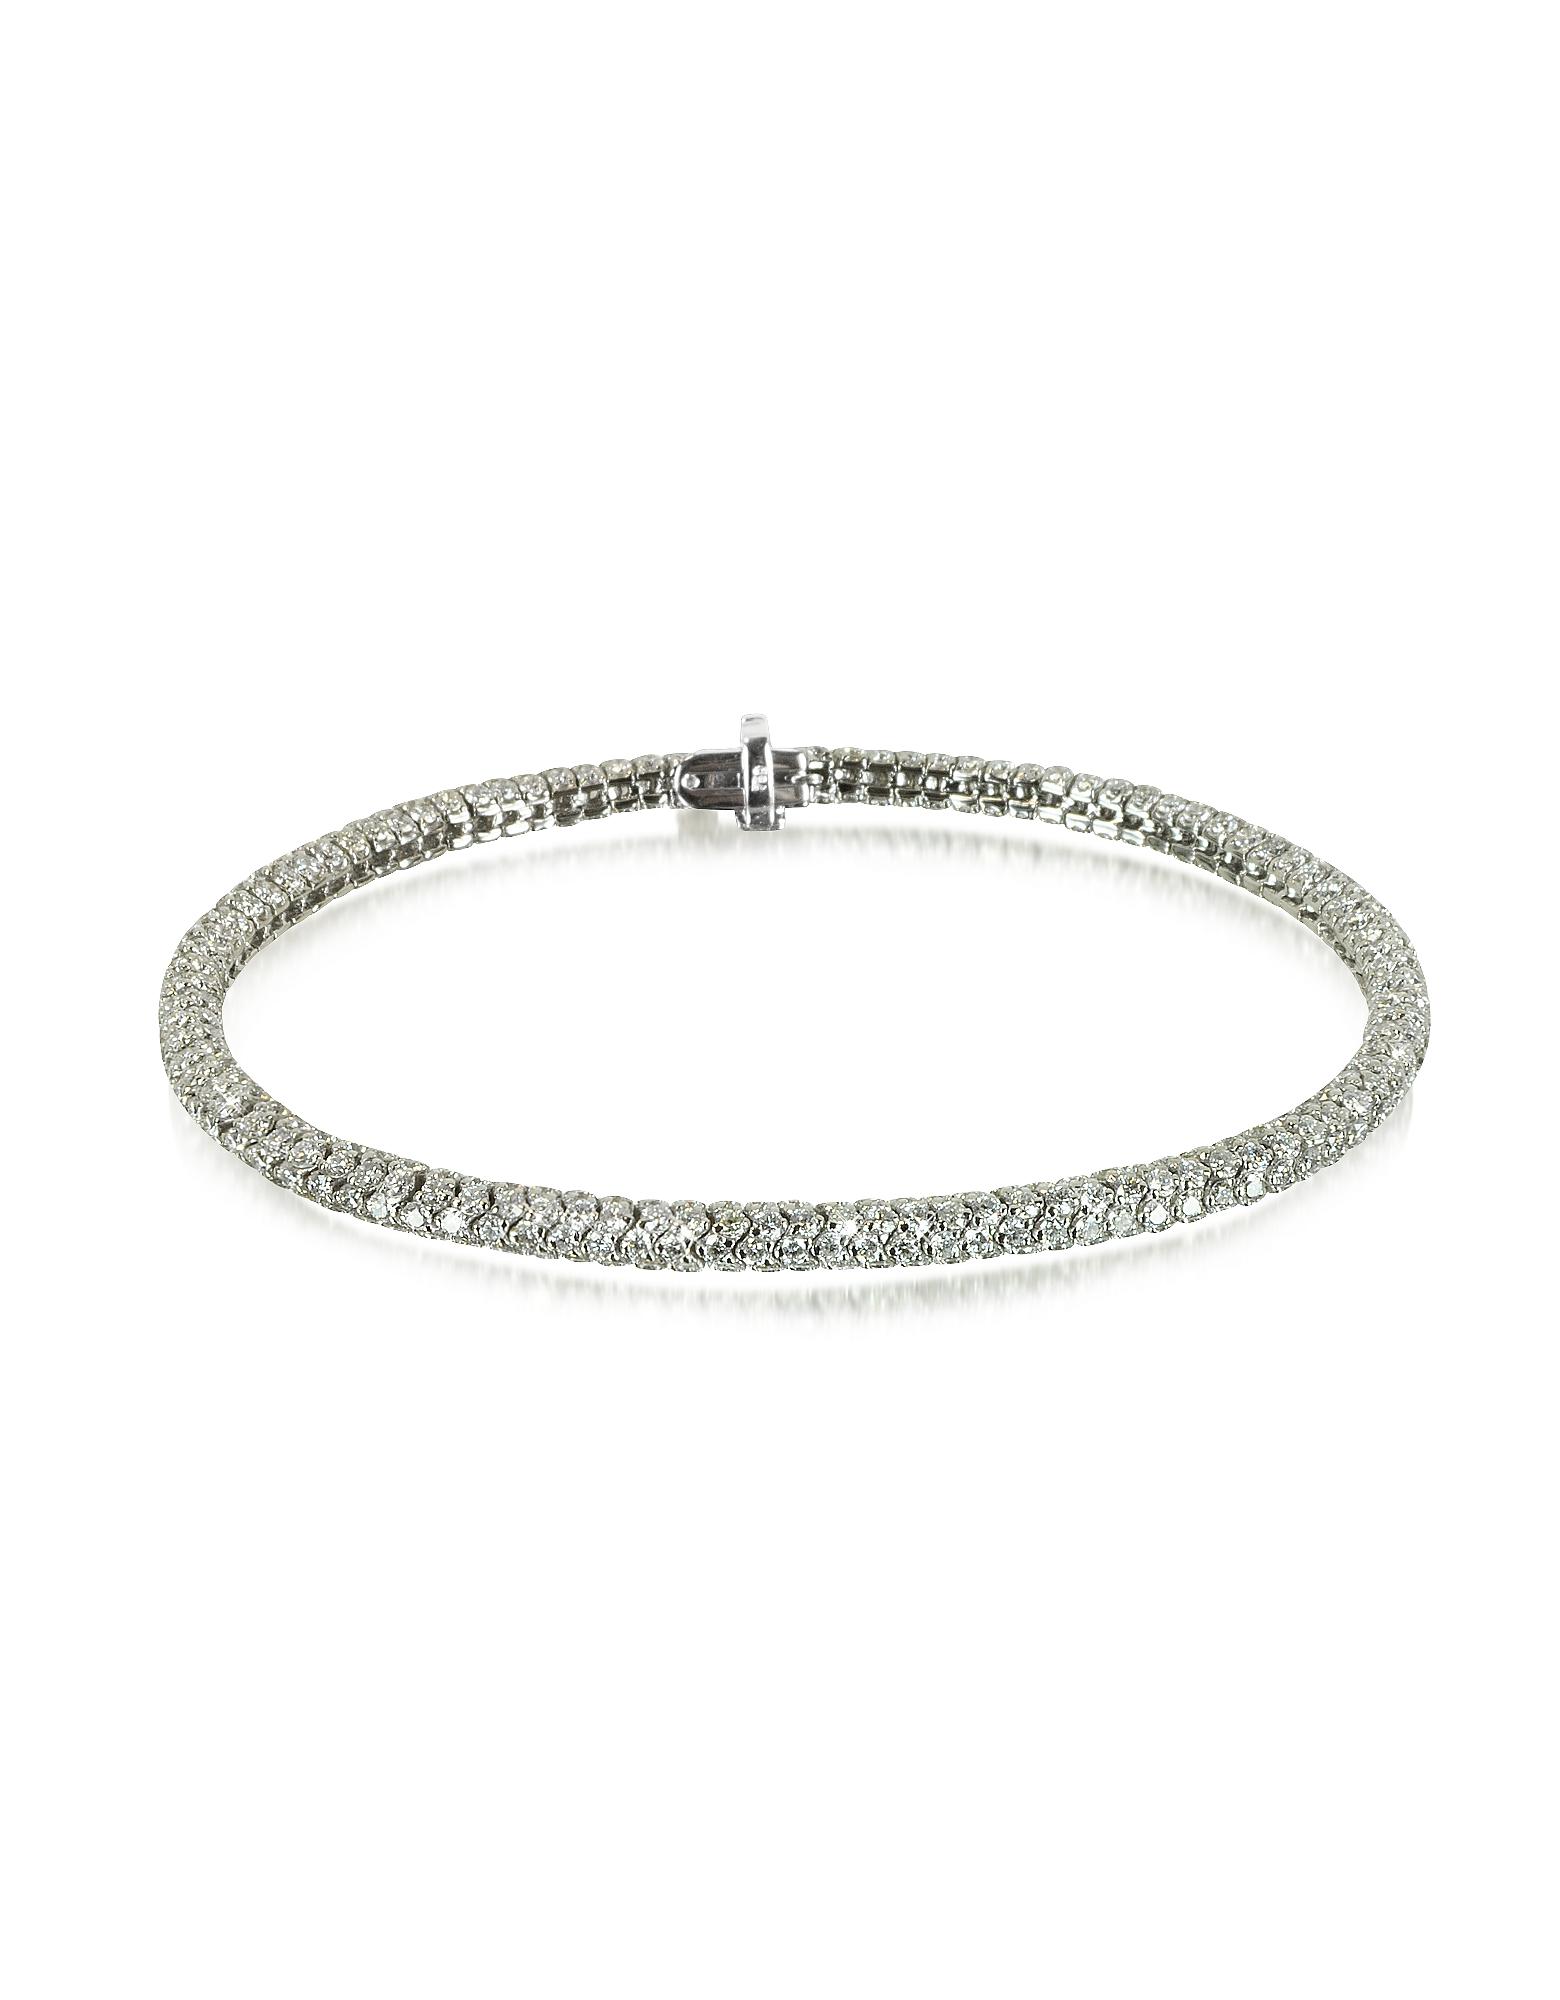 Christian Koban Bracelets, Clou White Diamond Bracelet